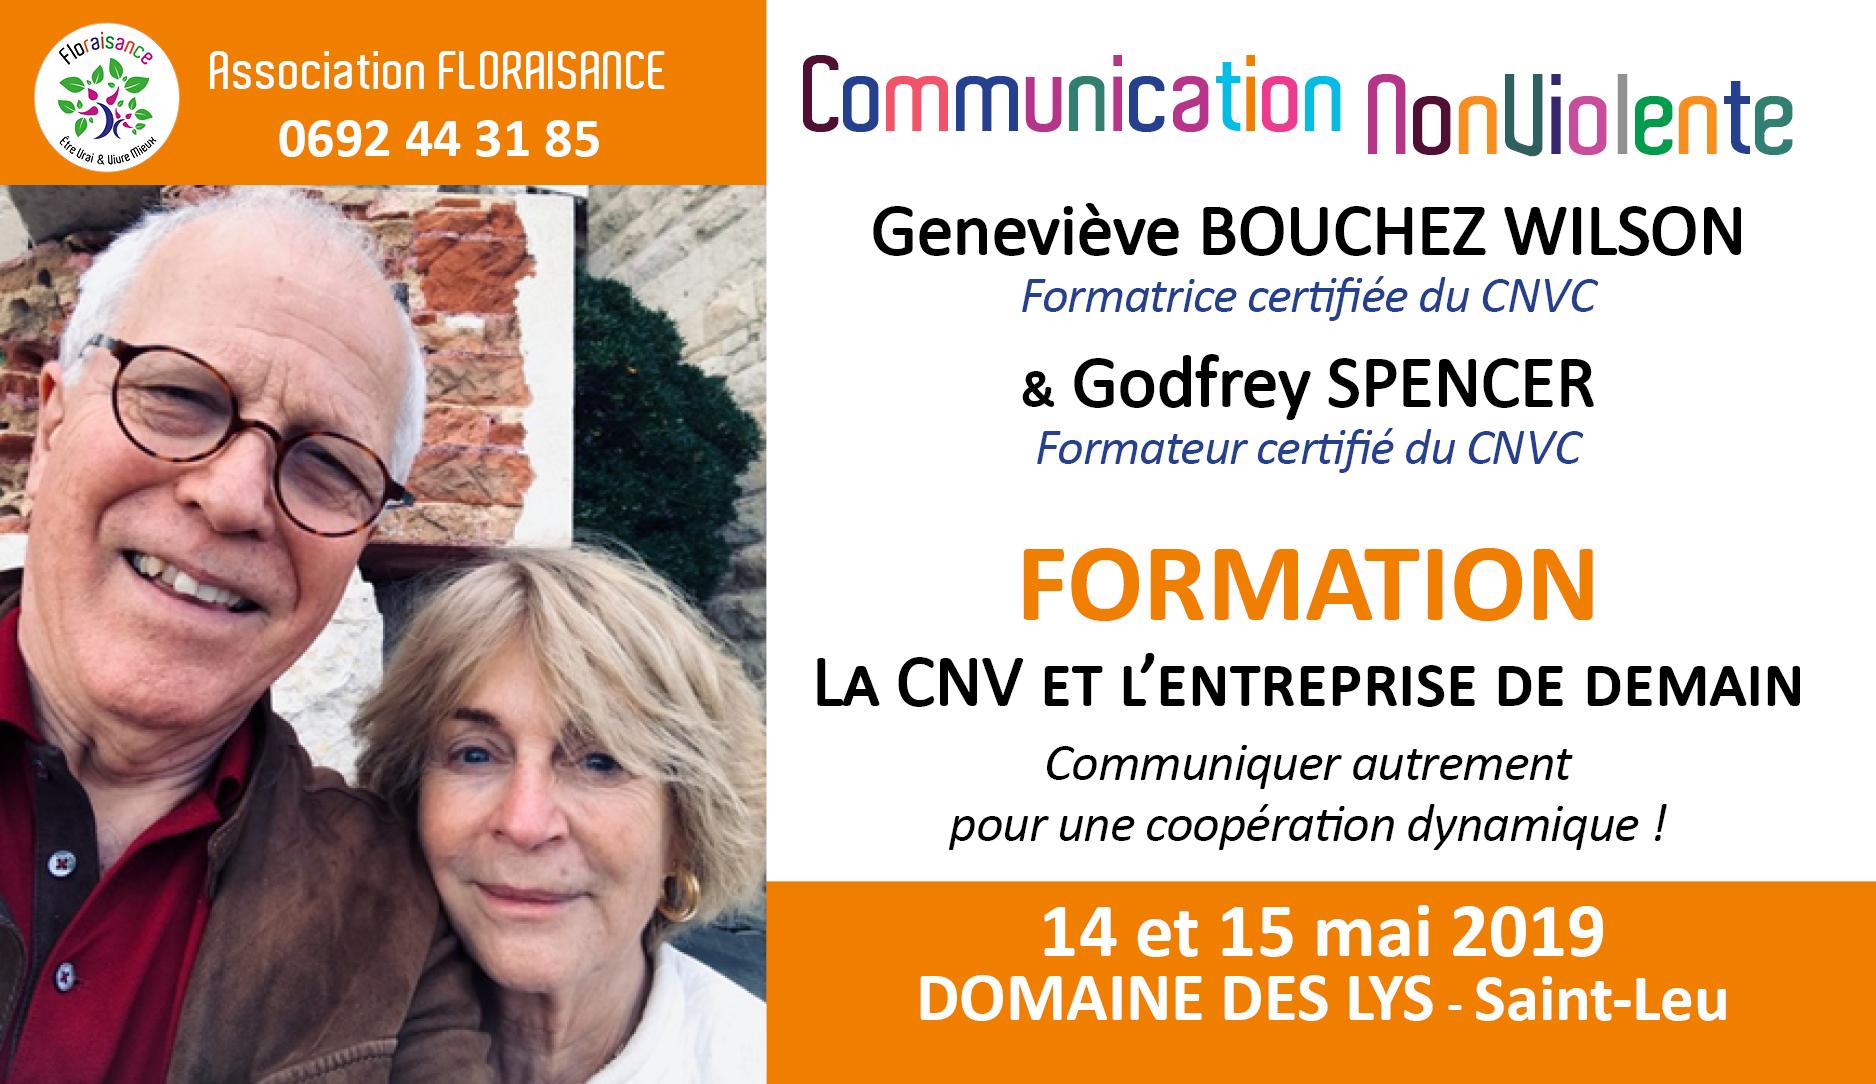 affiche Geneviève et Godfrey - formation 14 et 15 mai